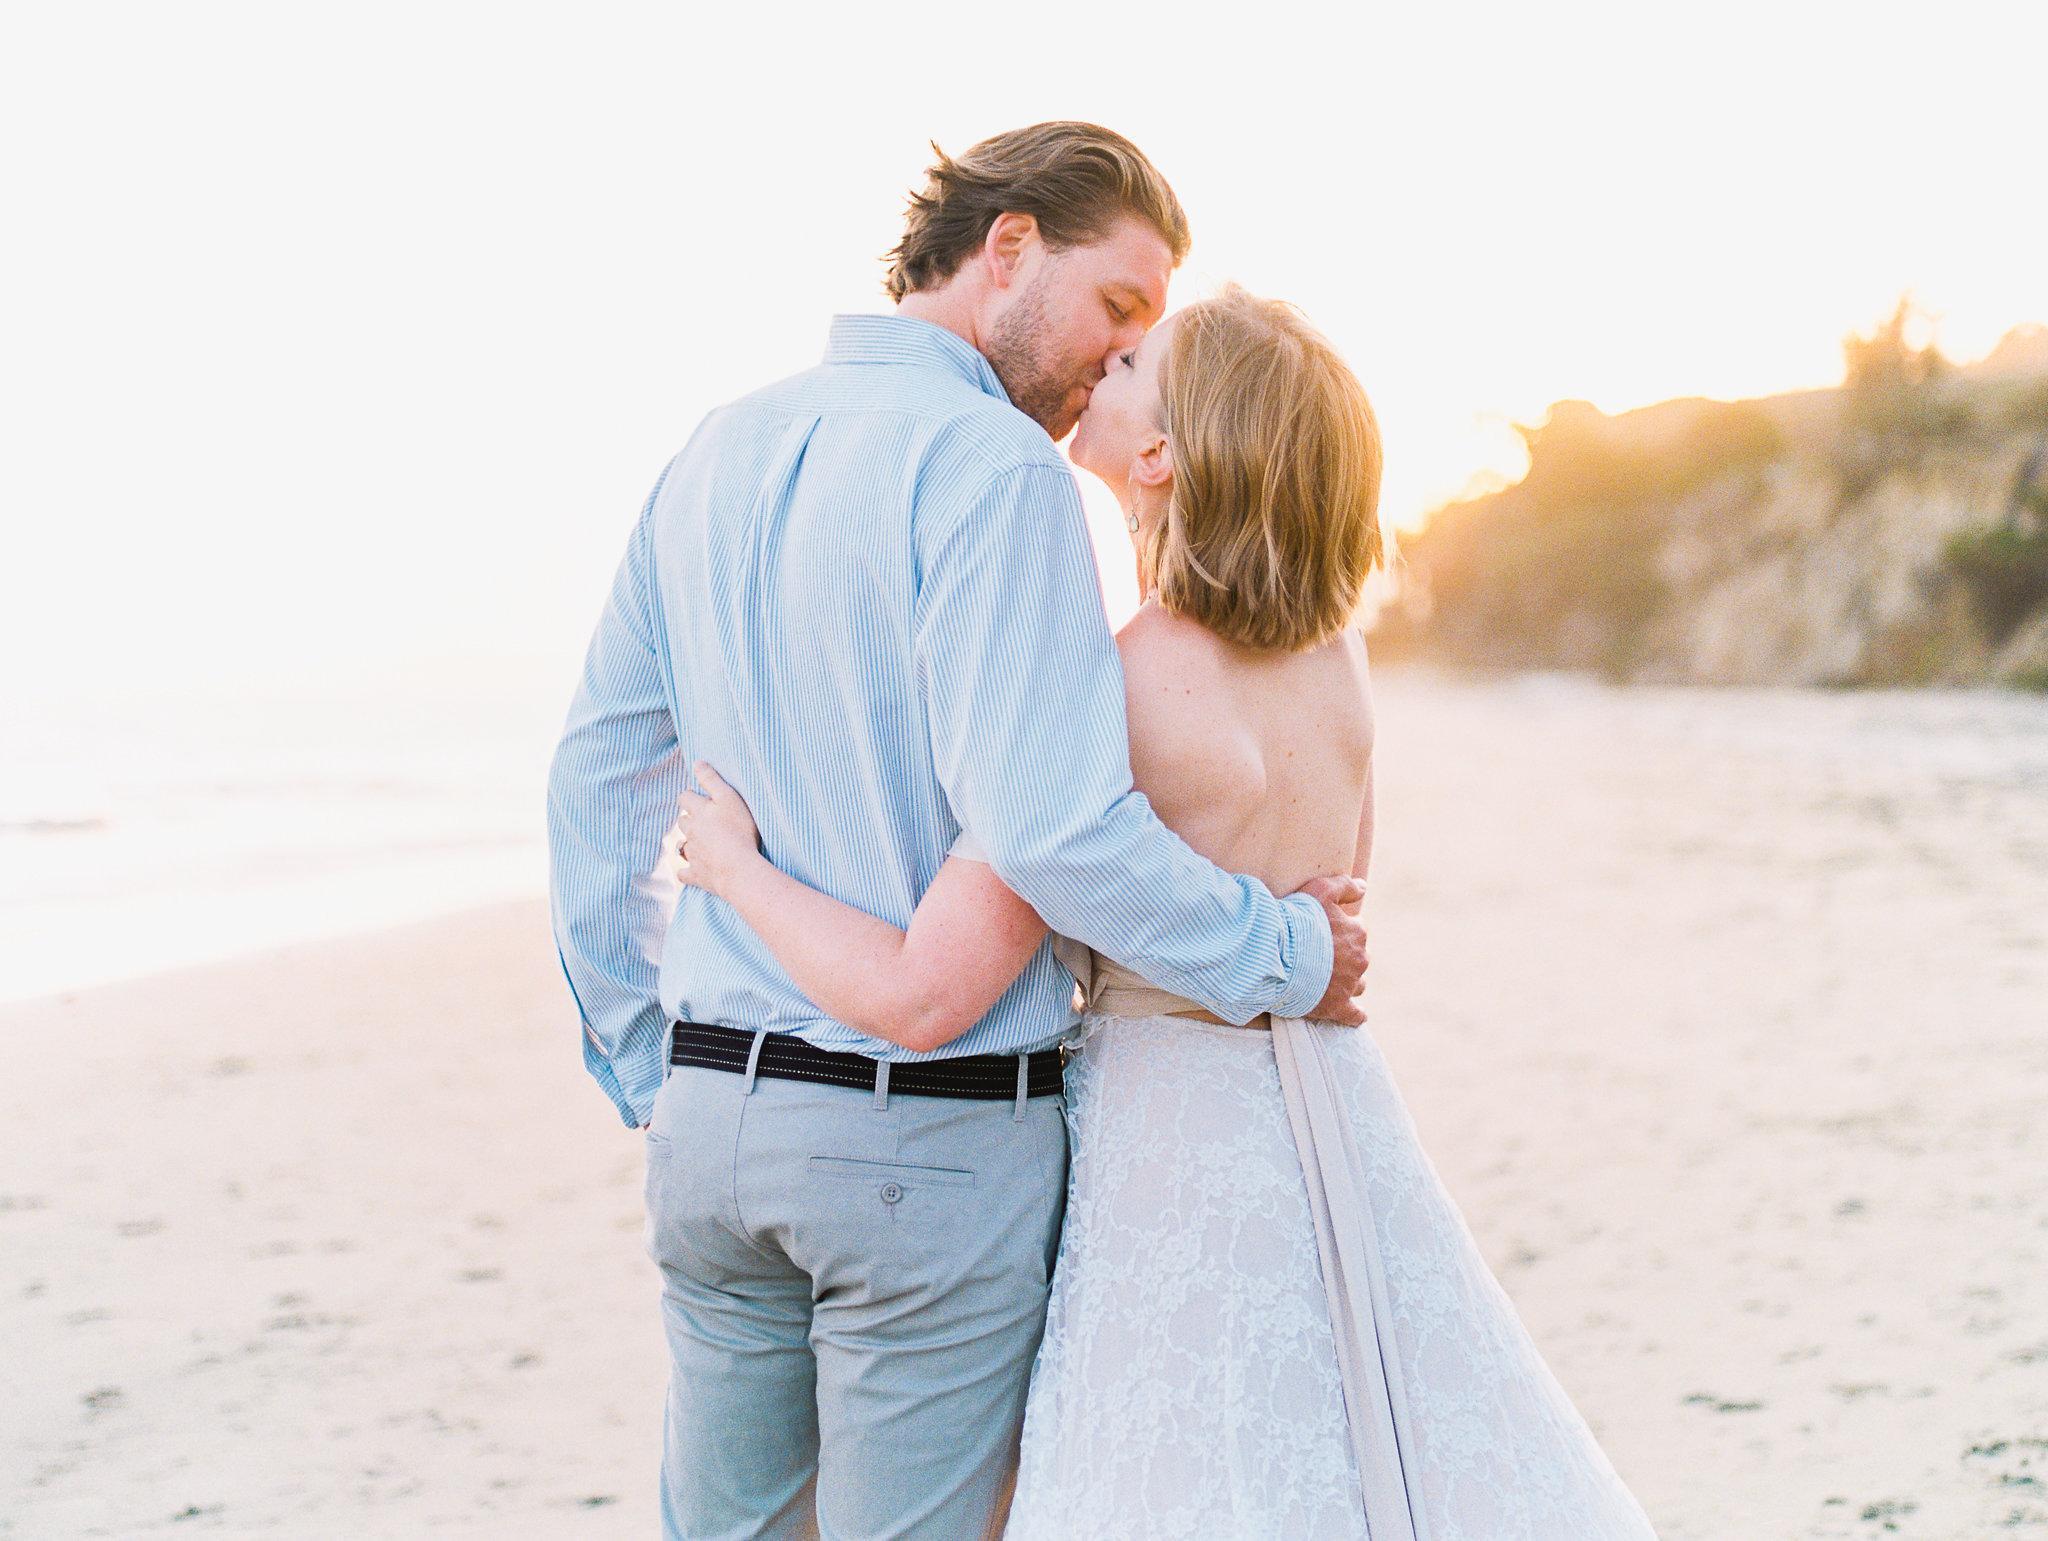 santa-barbara-elopement-wedding-elope-planner-event-design-coordinator-day-of-intimate-small-beach-ocean-view-front-lantern-blush-driftwood-summerland (9).jpg